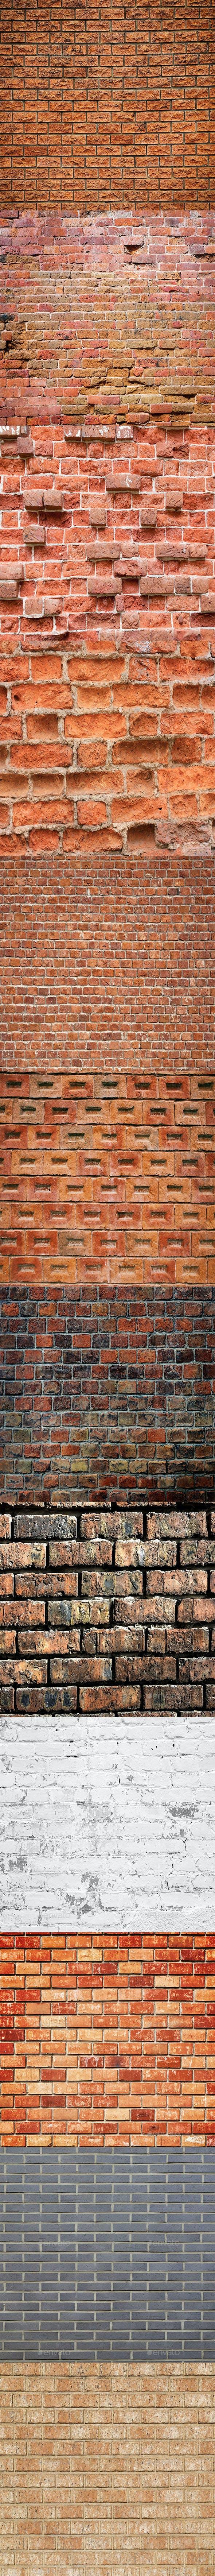 Twelve Brick Wall - 3DOcean Item for Sale